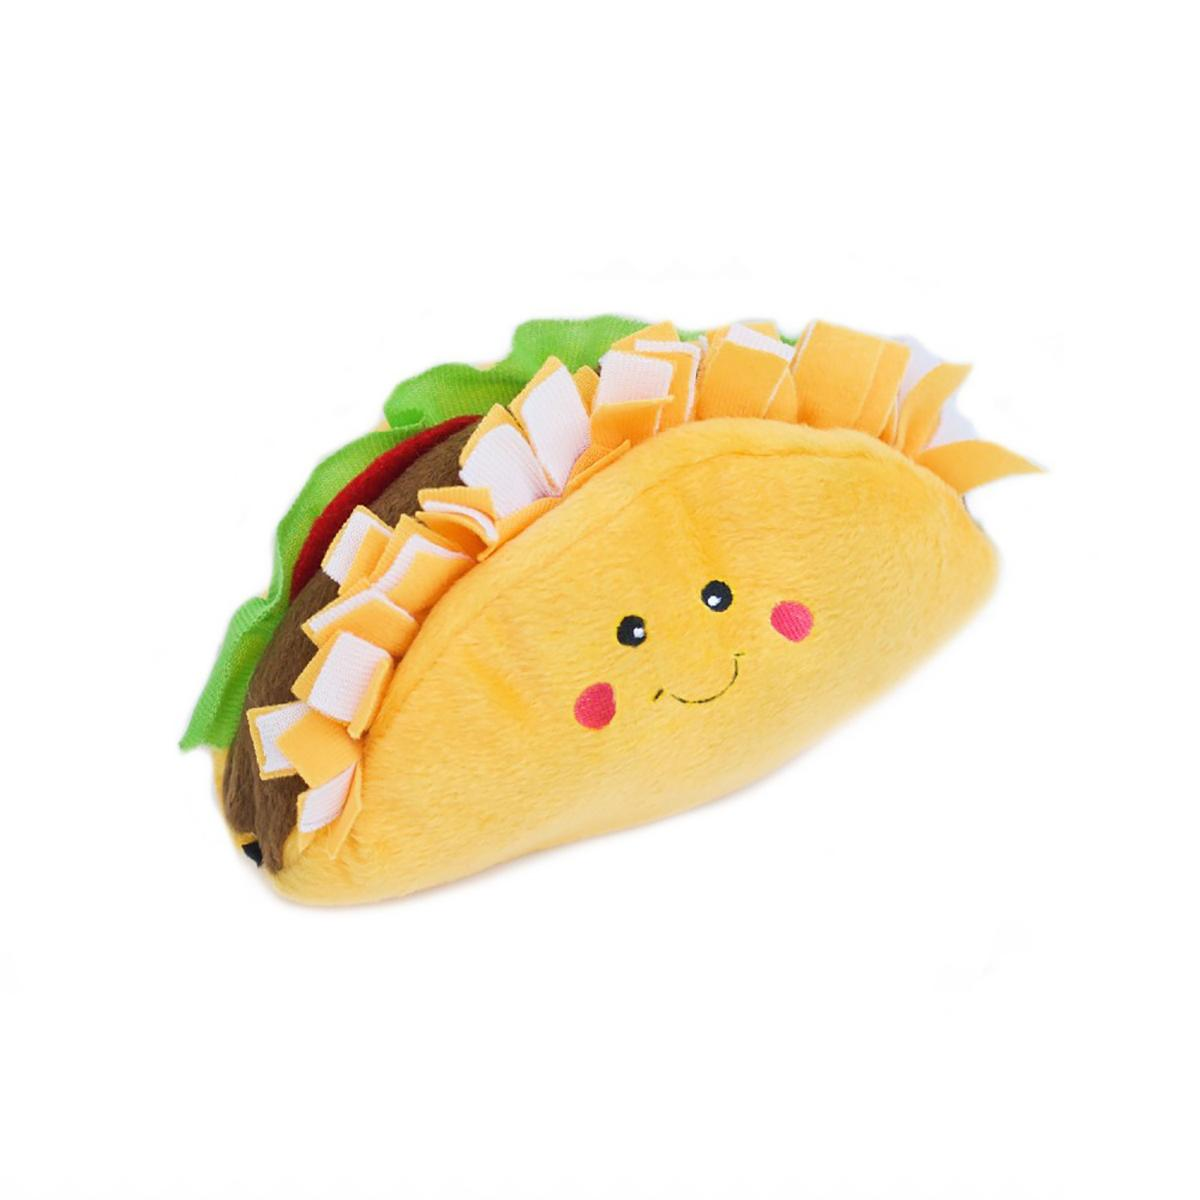 ZippyPaws NomNomz Dog Toy - Taco